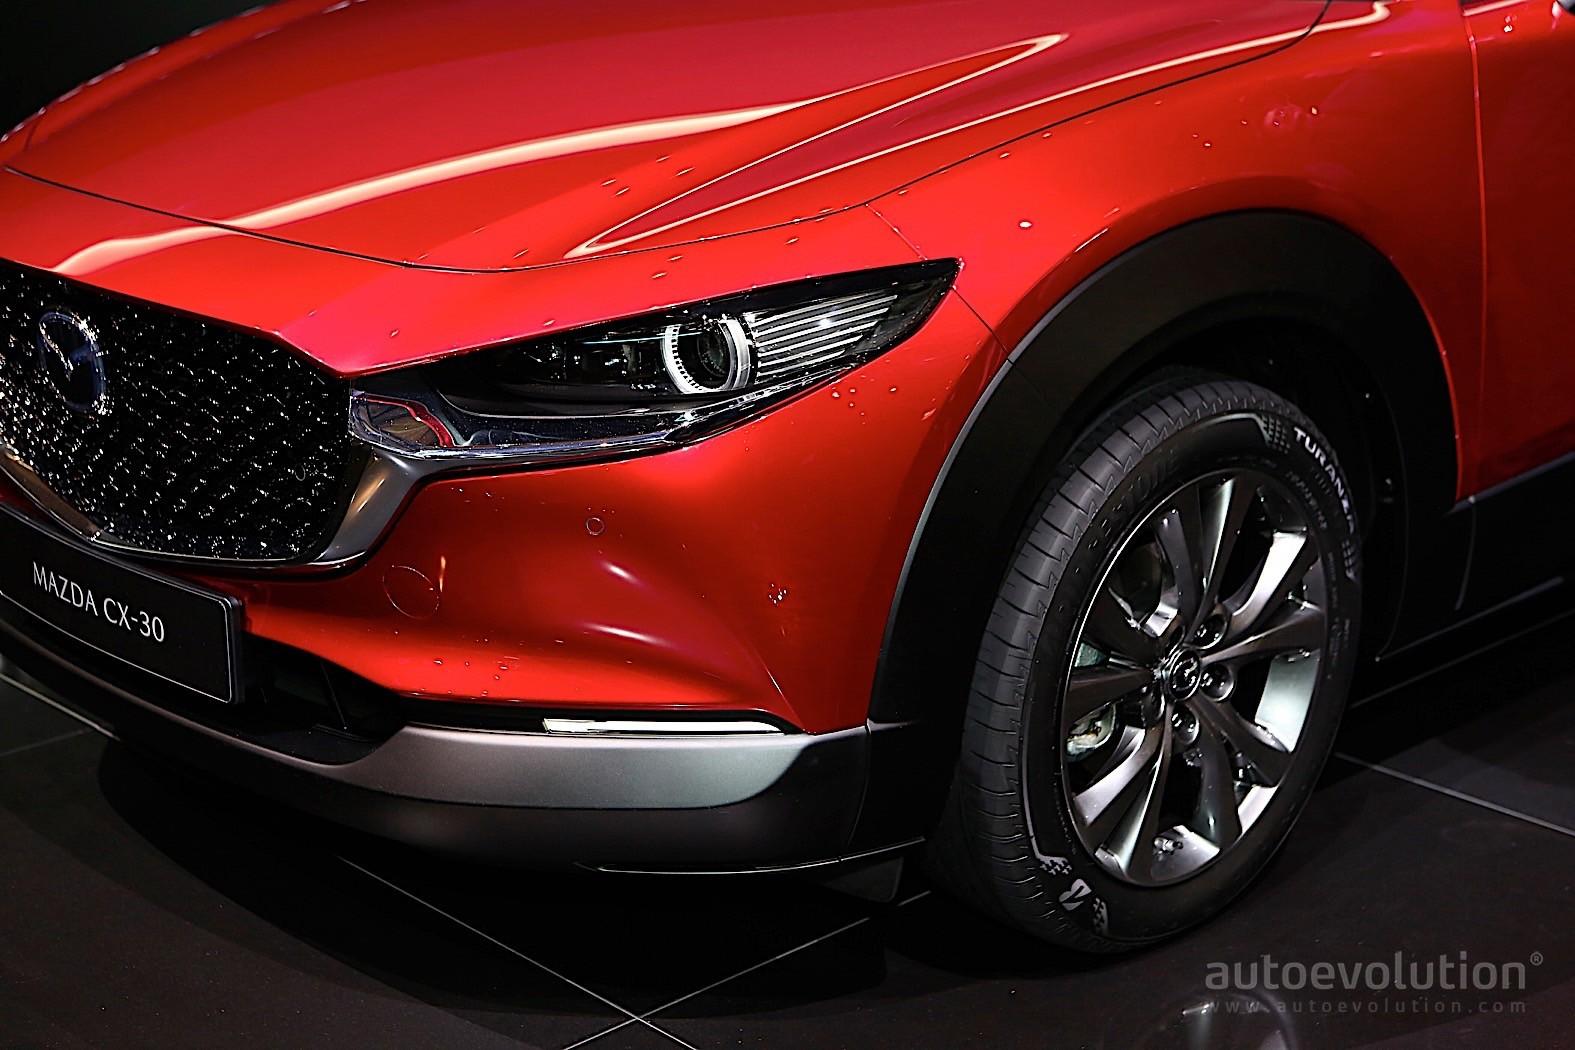 2020 Mazda CX30 Crossover Fills Gaps in Geneva  autoevolution